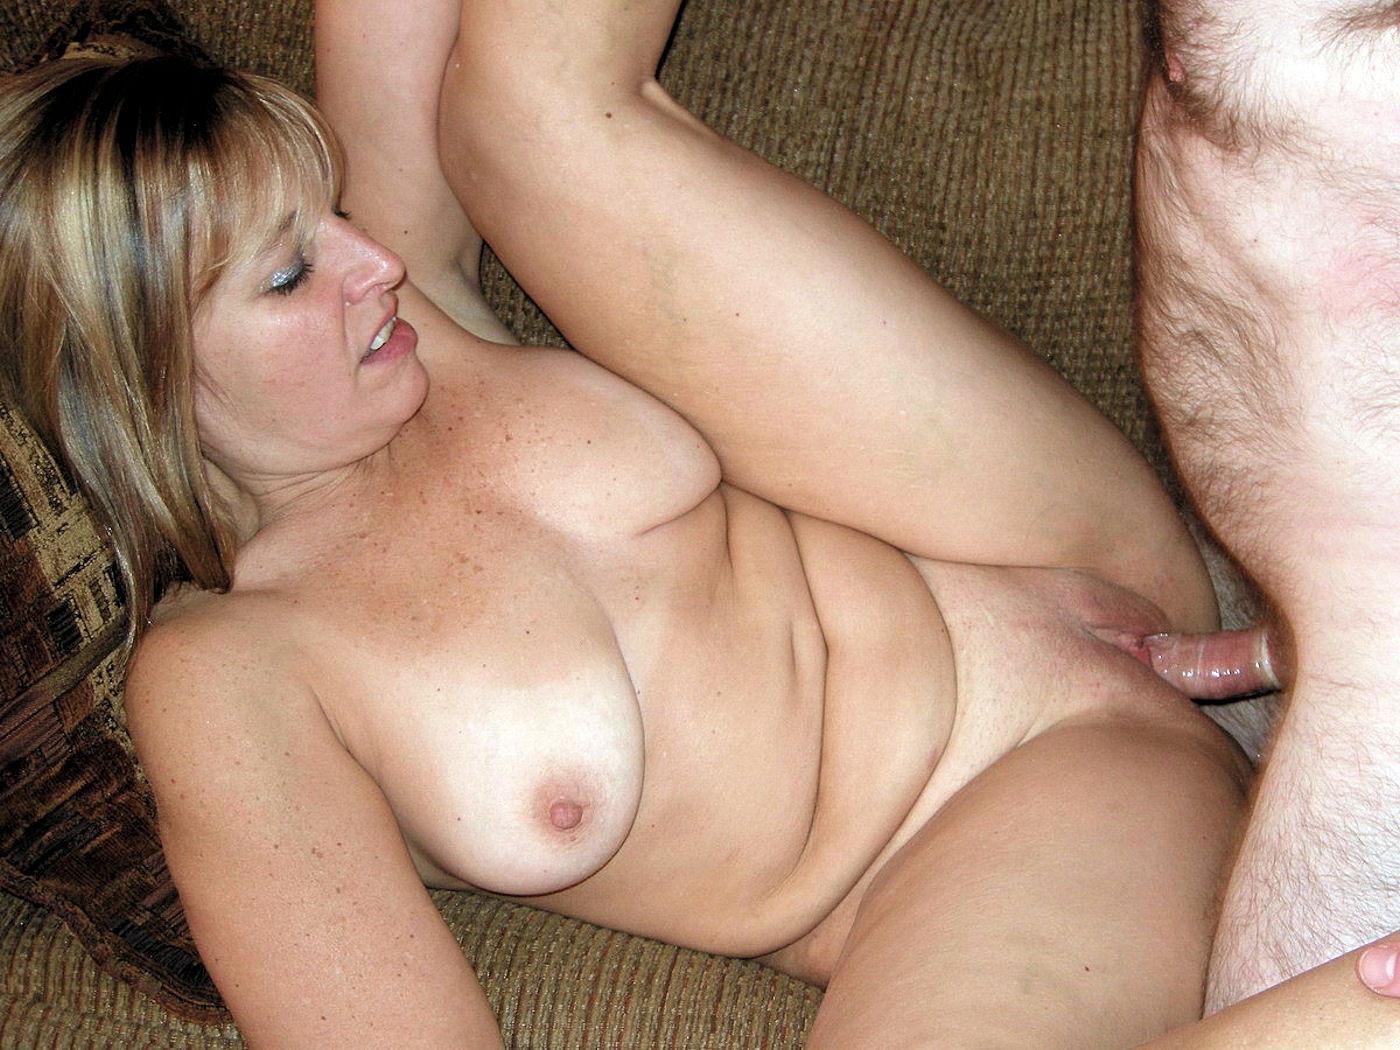 Rena mero nude